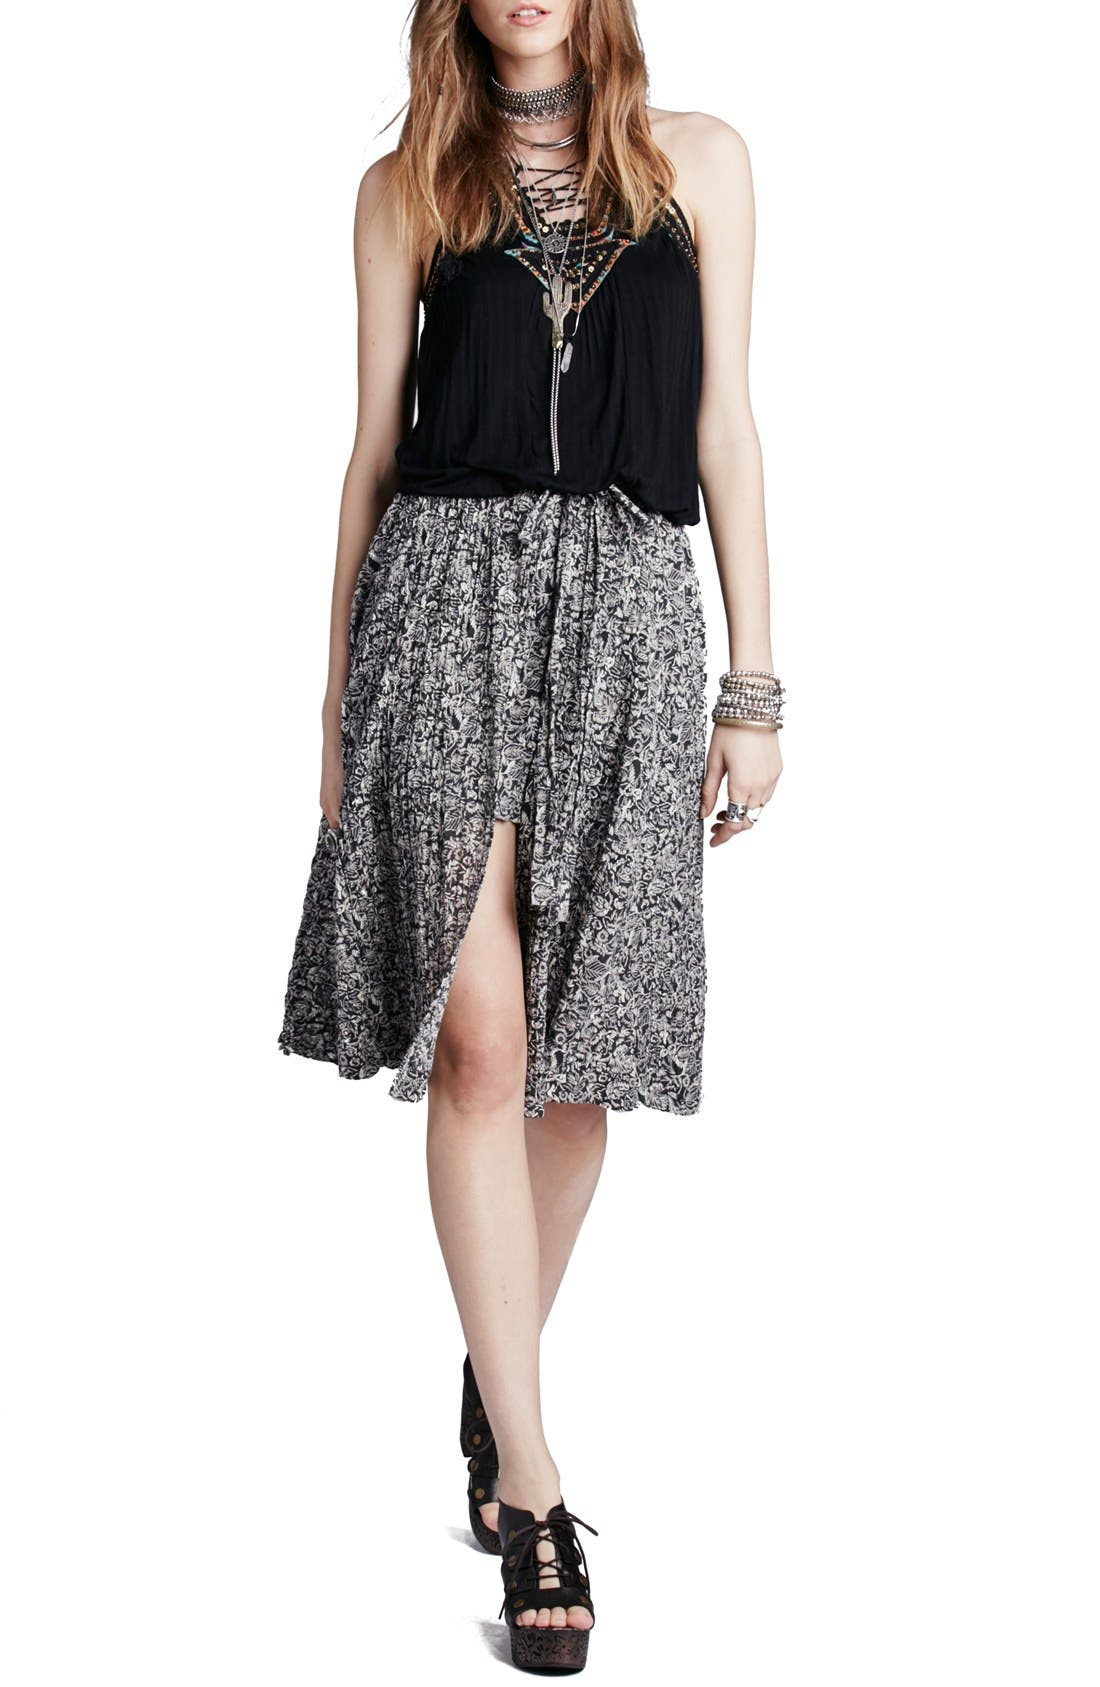 FREE PEOPLE 'Love Train' Wrap Skirt, Main, color, 001